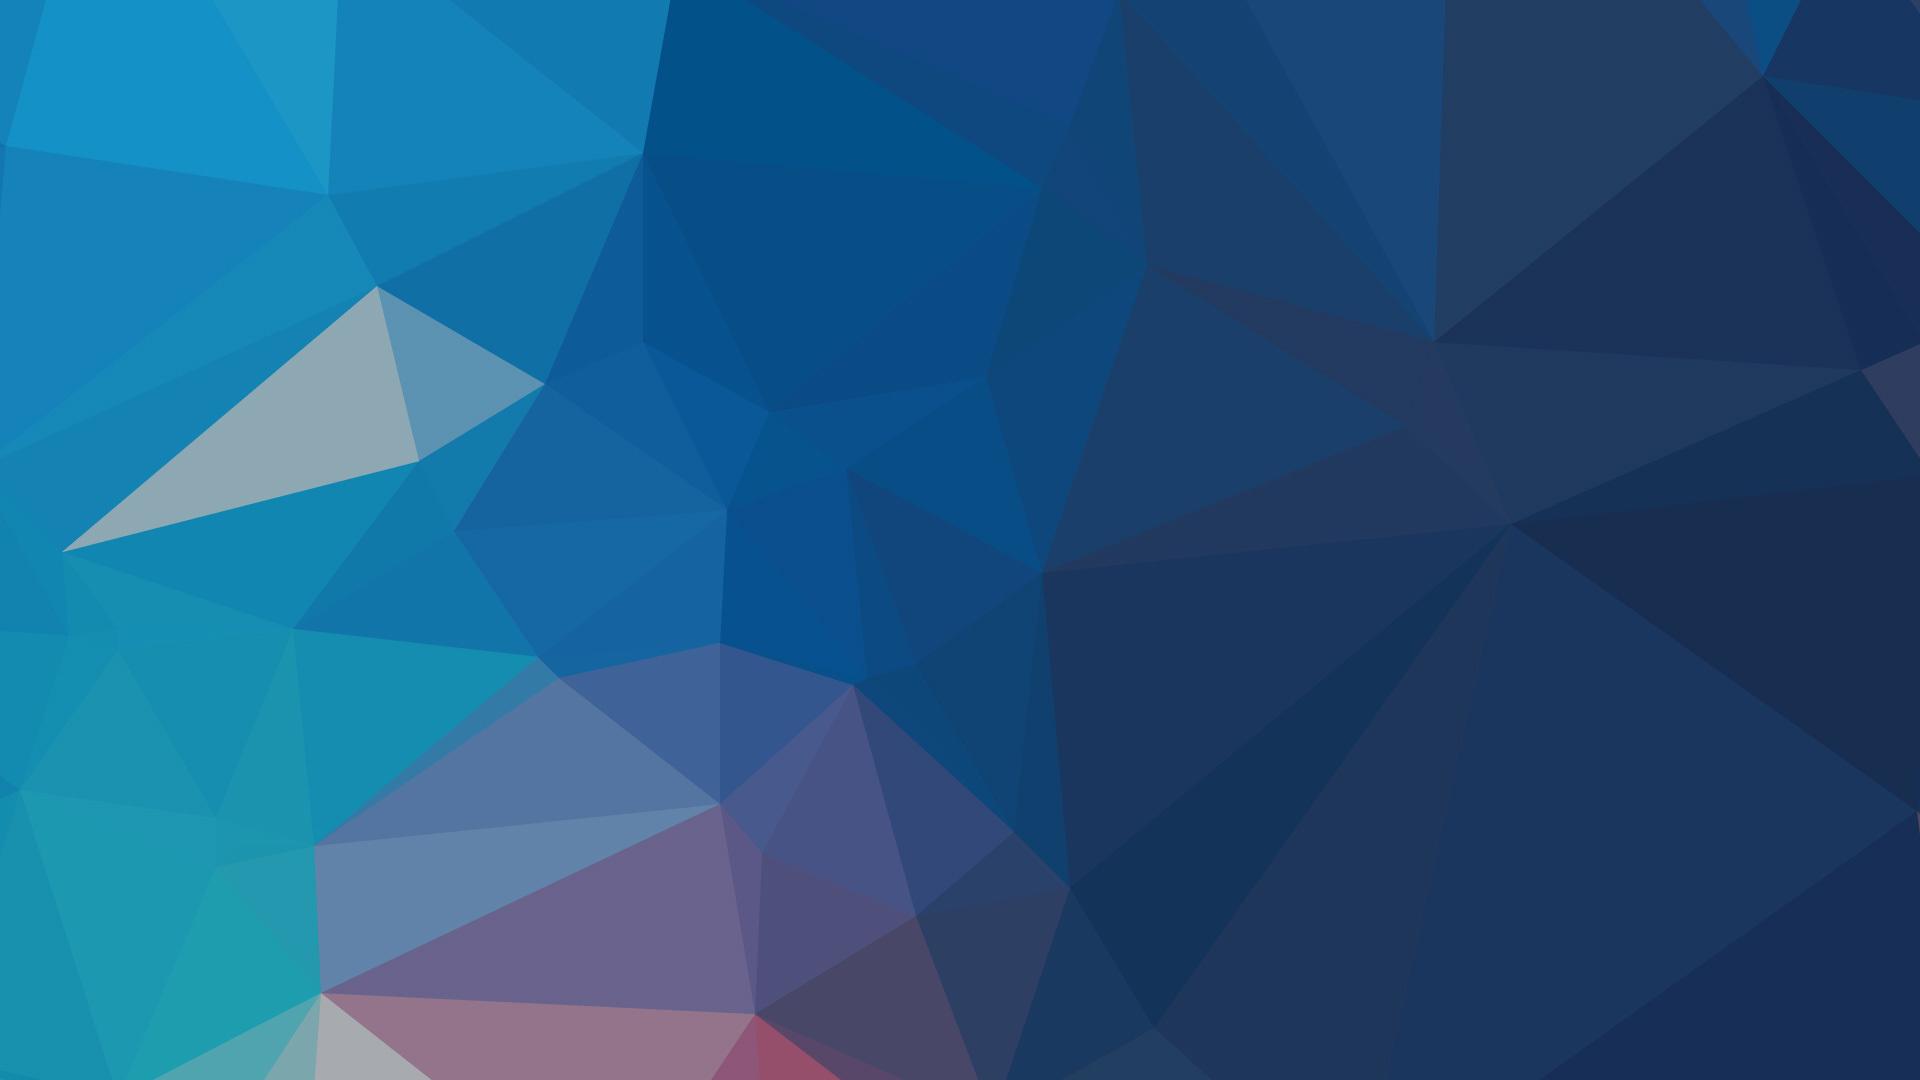 Дизайн: мода на геометрические фигуры в бэкграундах  — Talks — Форум